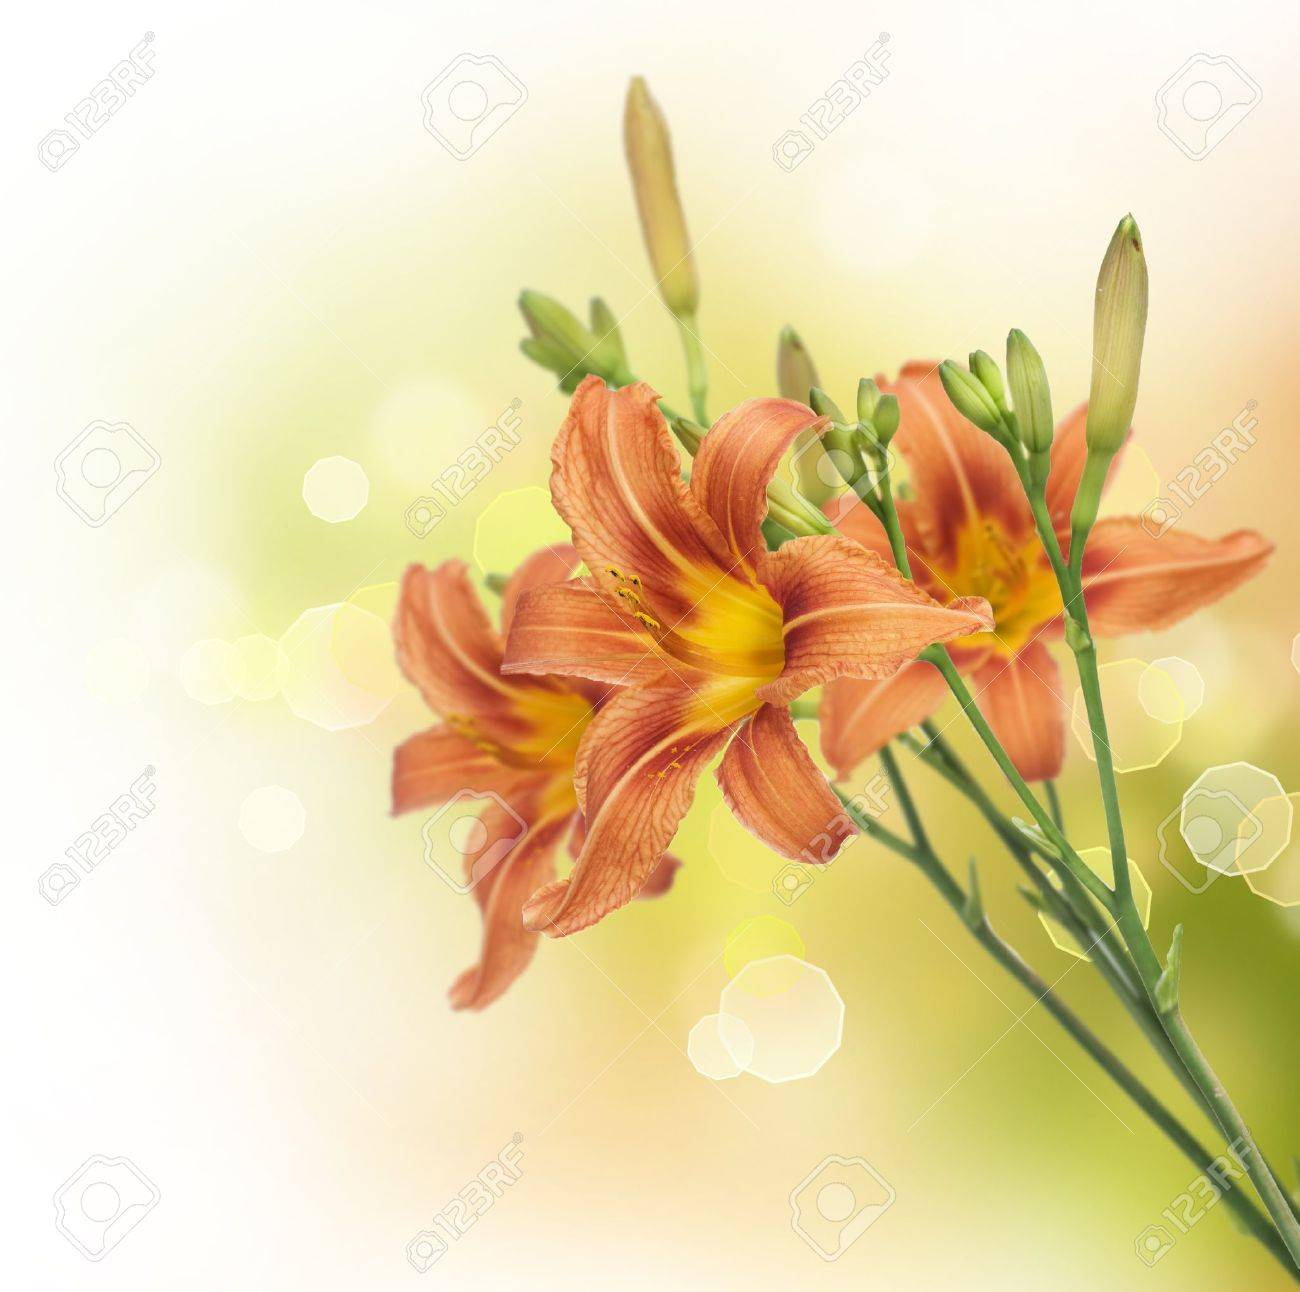 Yellow lily flower border design stock photo picture and royalty stock photo yellow lily flower border design izmirmasajfo